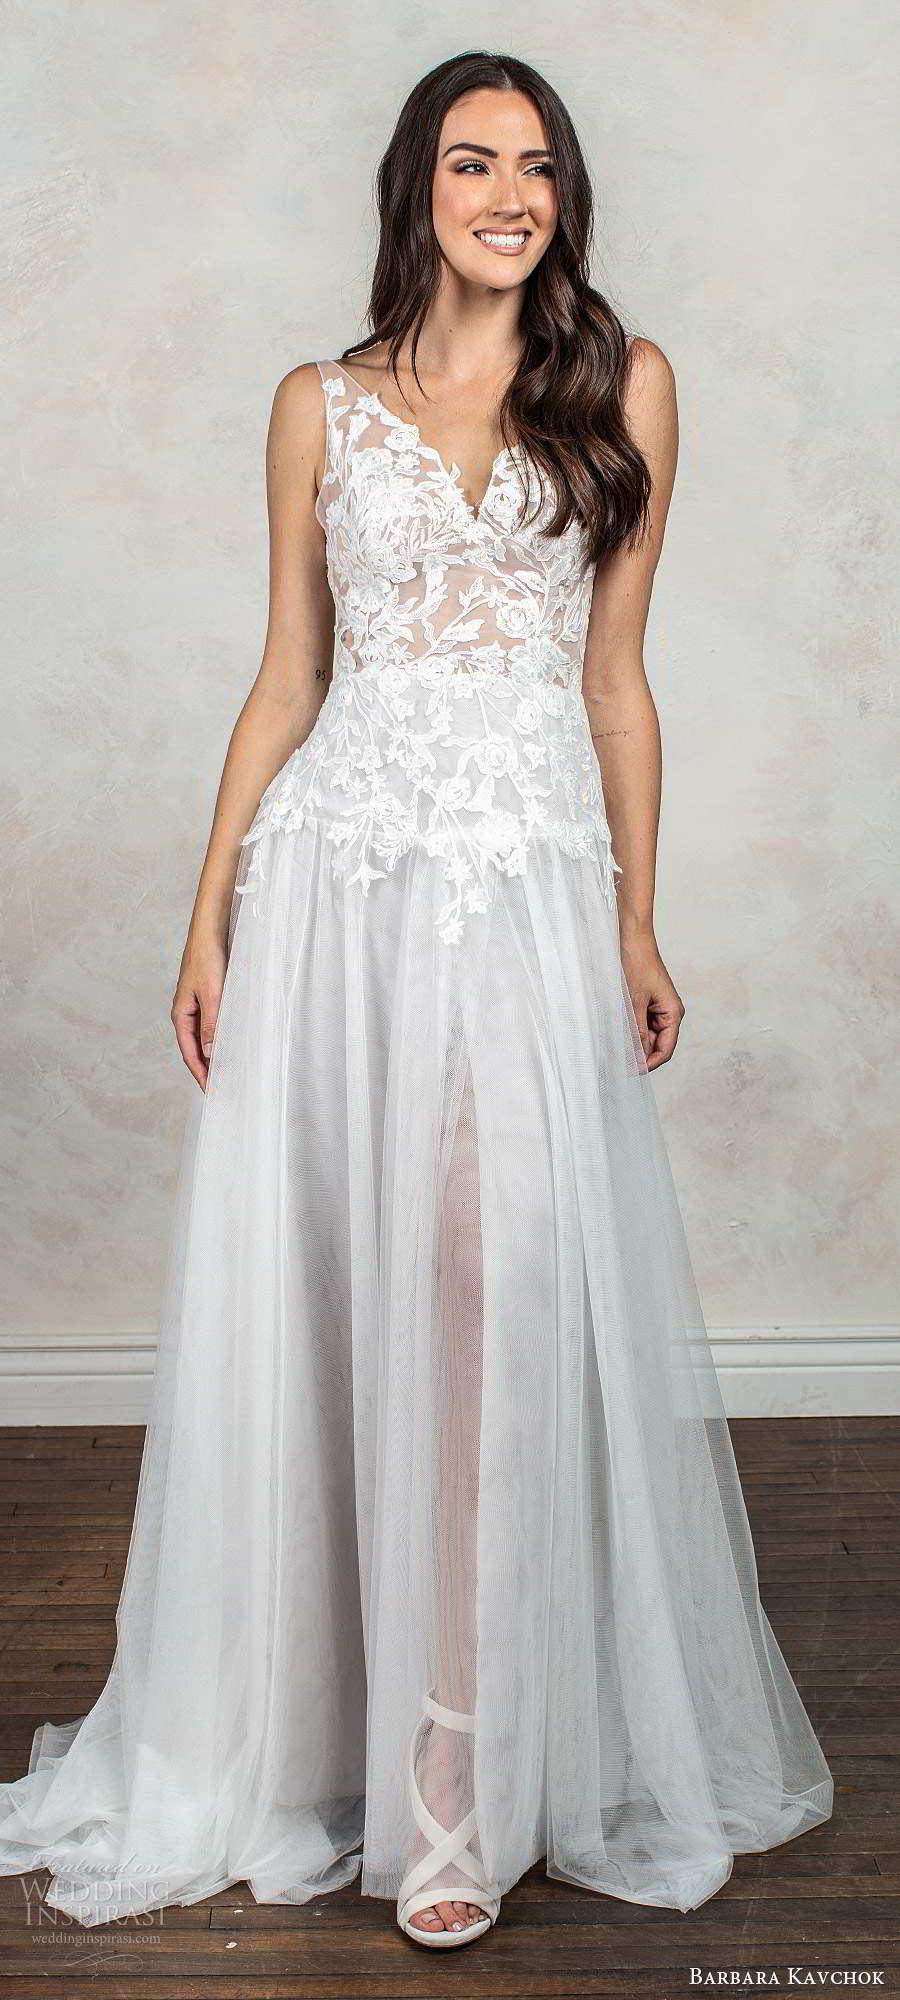 barbara kavchok fall 2020 bridal sleeveless illusion straps v neckline embellished sheer bodice a line ball gown wedding dress chapel train (6) mv